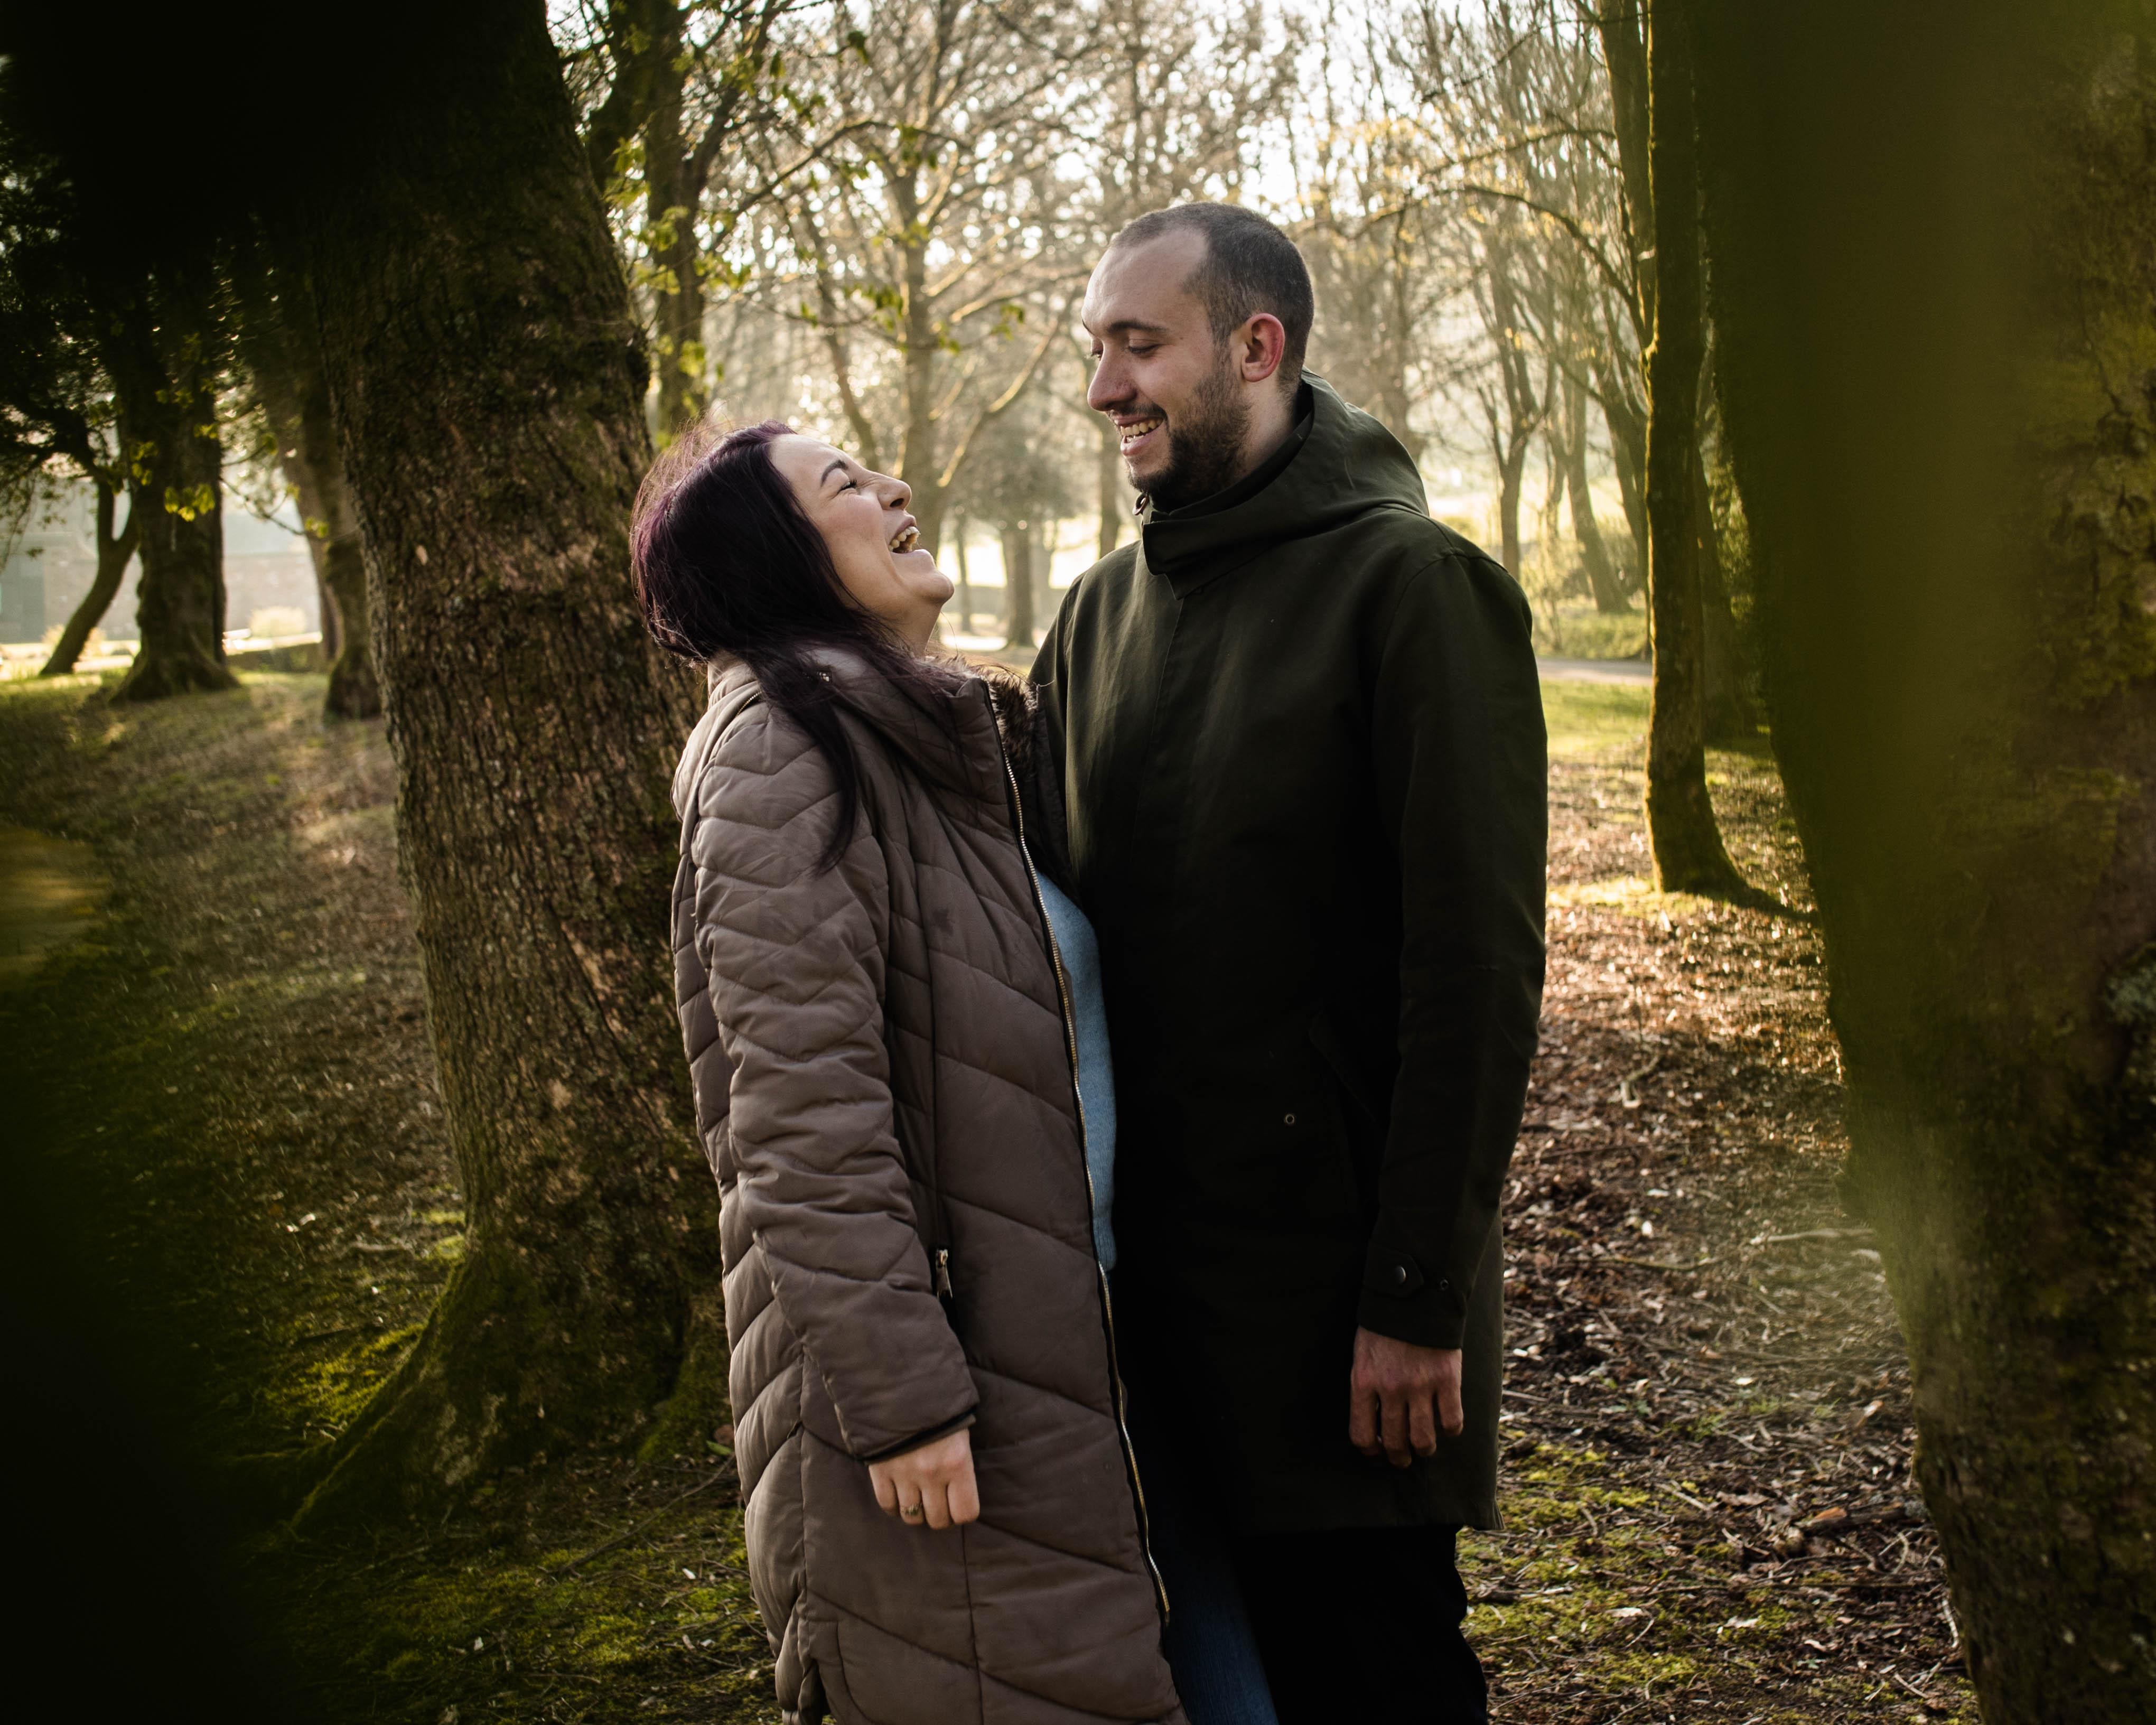 A Sunny Lancashire engagement photoshoot at StubbyLee Park